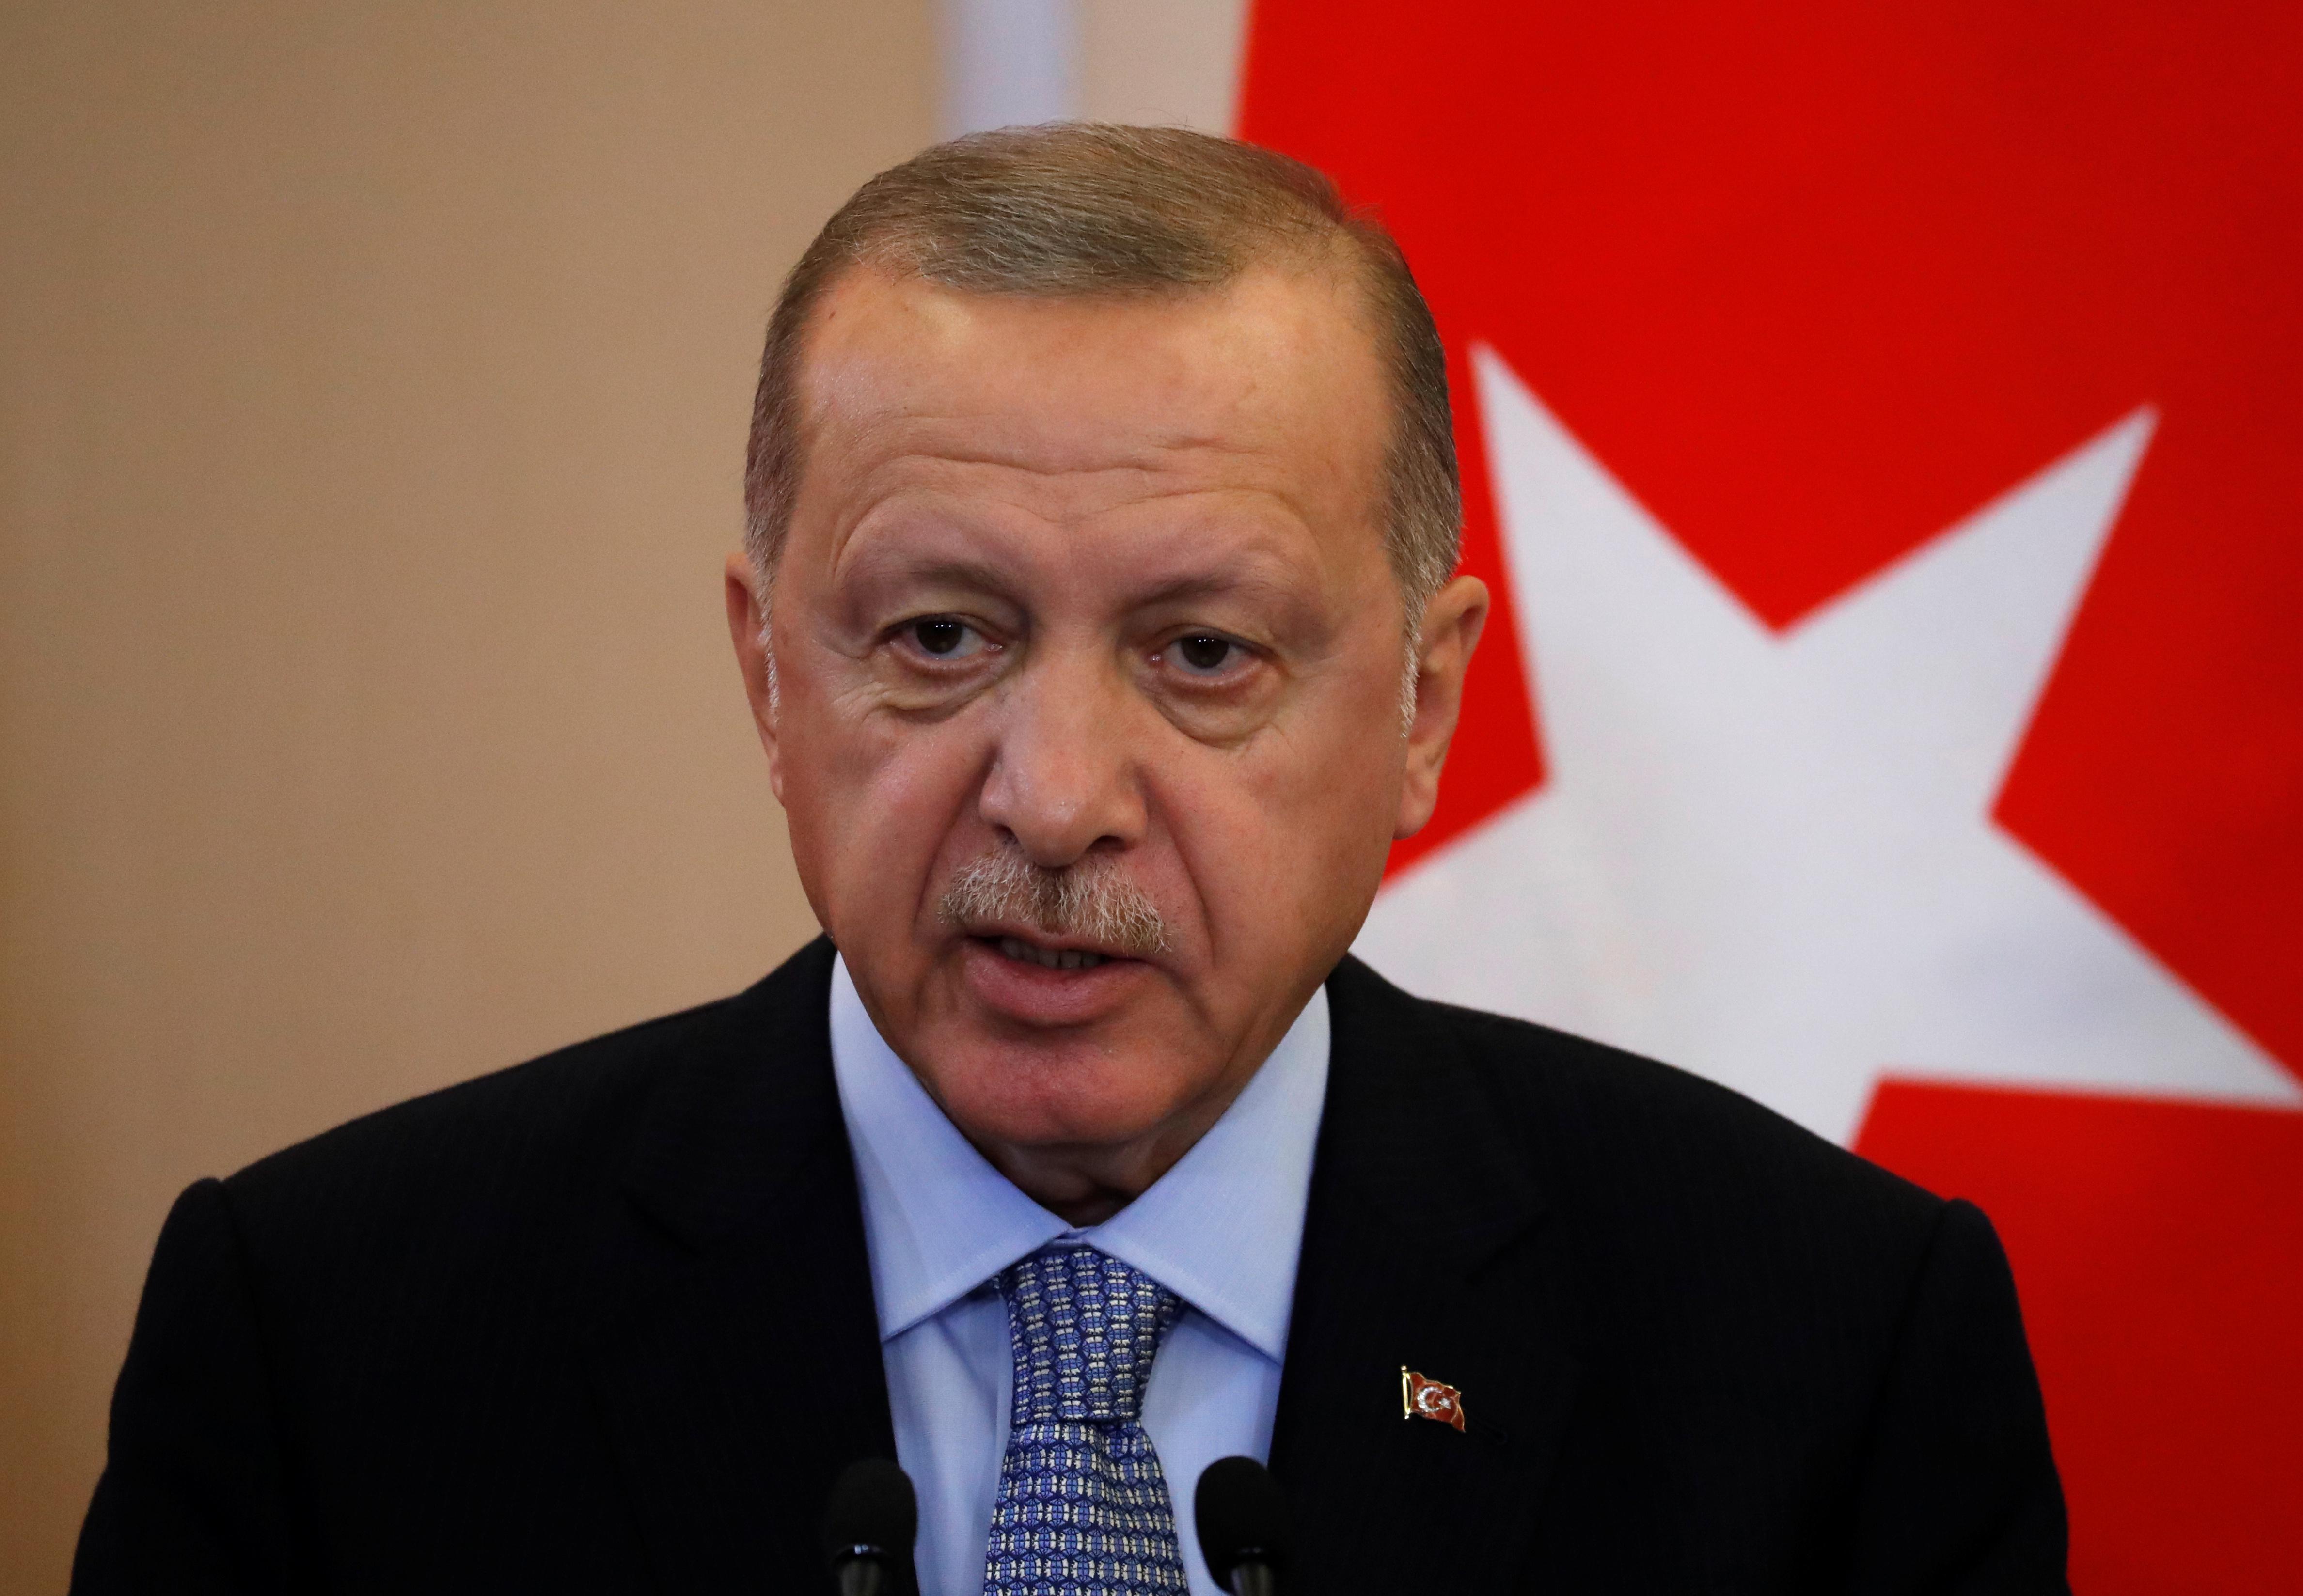 Erdogan: YPG will not stay in Syria border region in 'regime clothes'